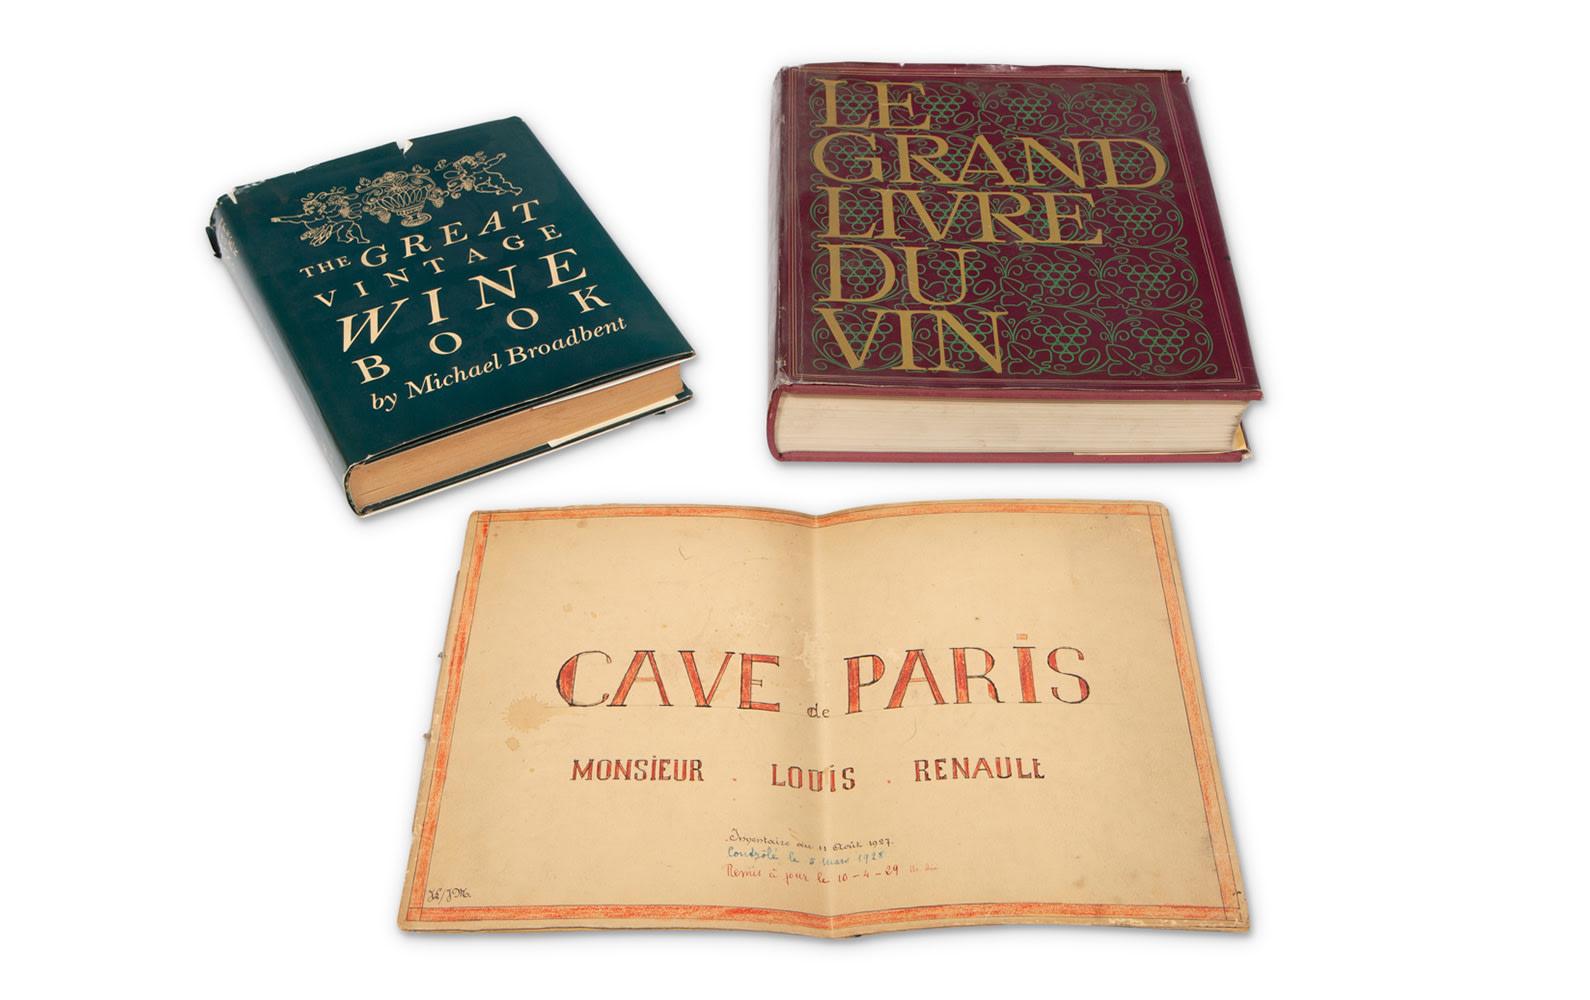 Prod/O21E - Phil Hill C 2021/C0045_The Great Vintage Wine by Michael Broadbent and Le Grand Livre Du Vin Books and a Map of the Cave de Paris Monsieur Louis Renault/C0045_Great_Vintage_Wine_Books_Map_1_pwbeqe